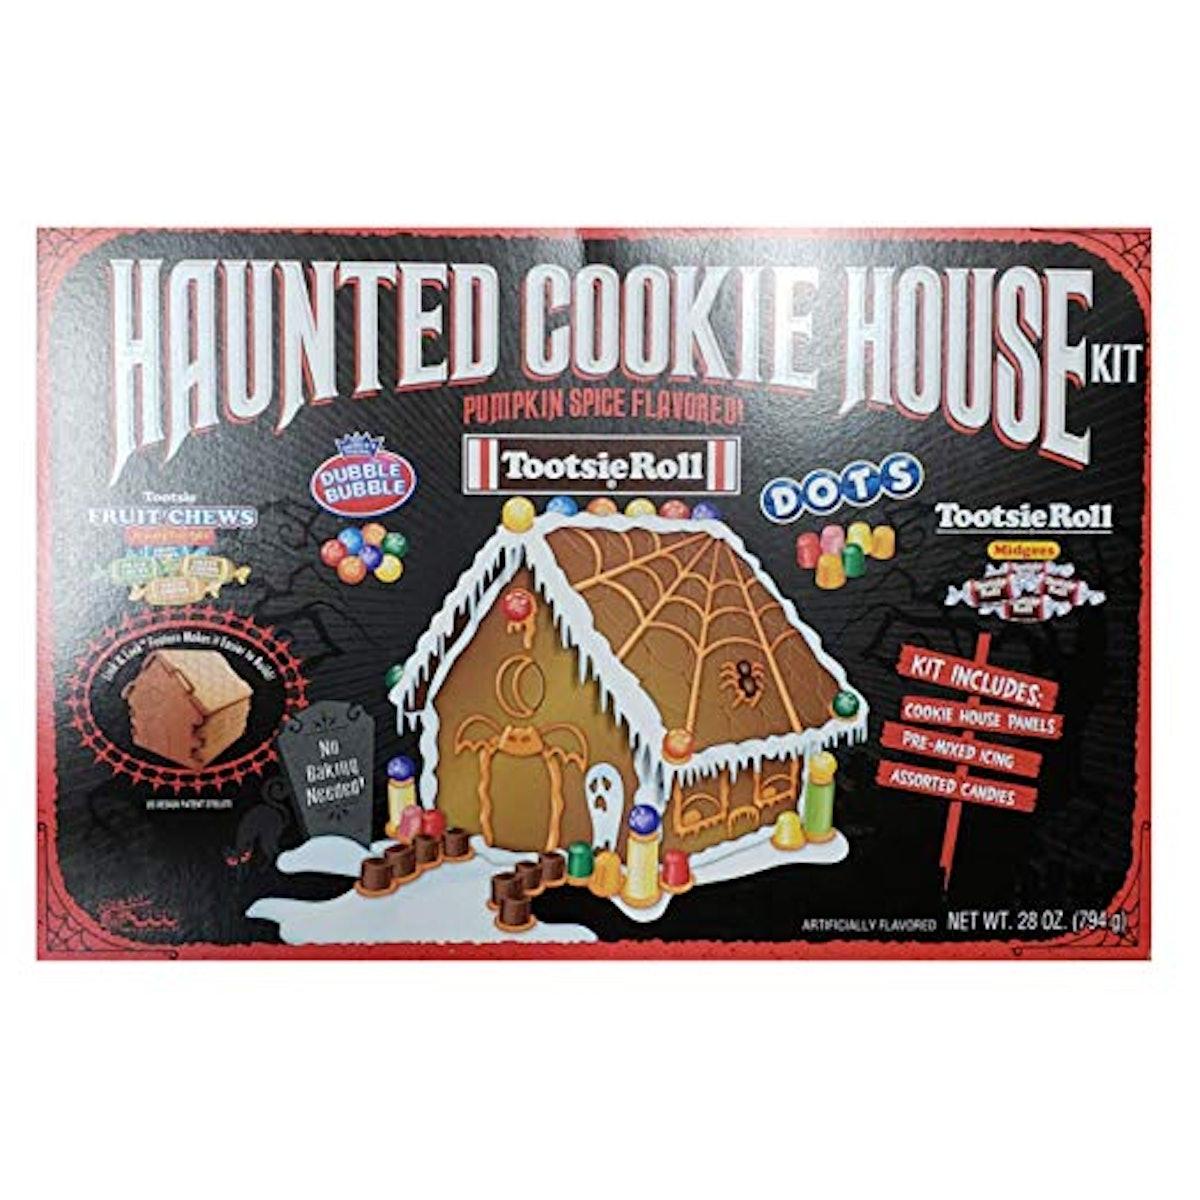 Halloween Haunted Cookie House Kit